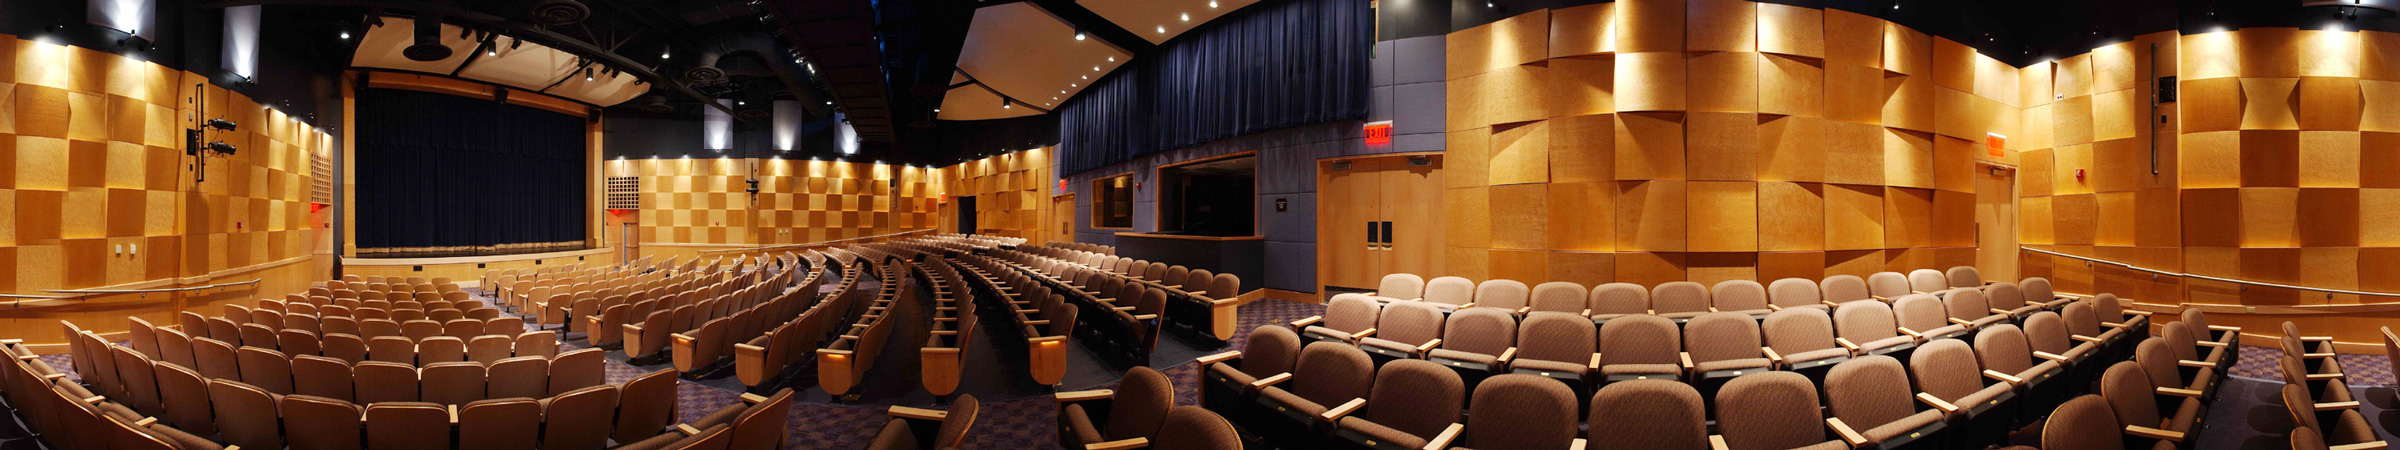 Sanply-maple-be-fla-mem-auditorium-360_8009900518_o